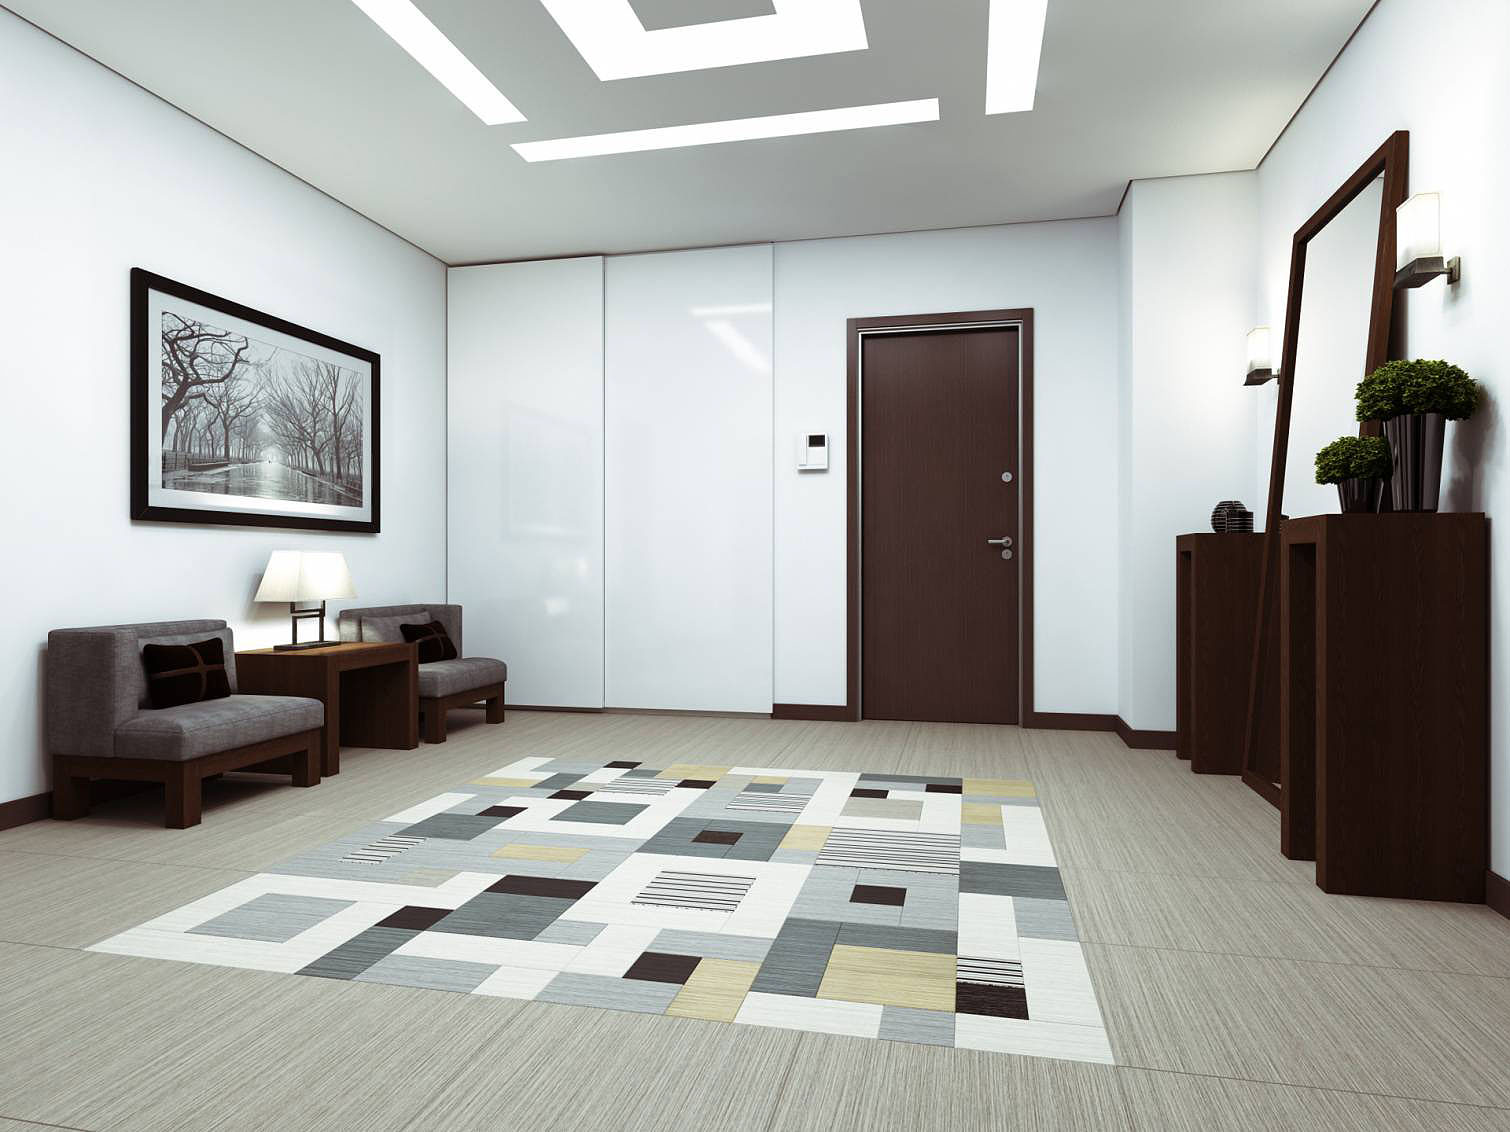 Apartment-Design-in-Moskovyan-Plaza-01